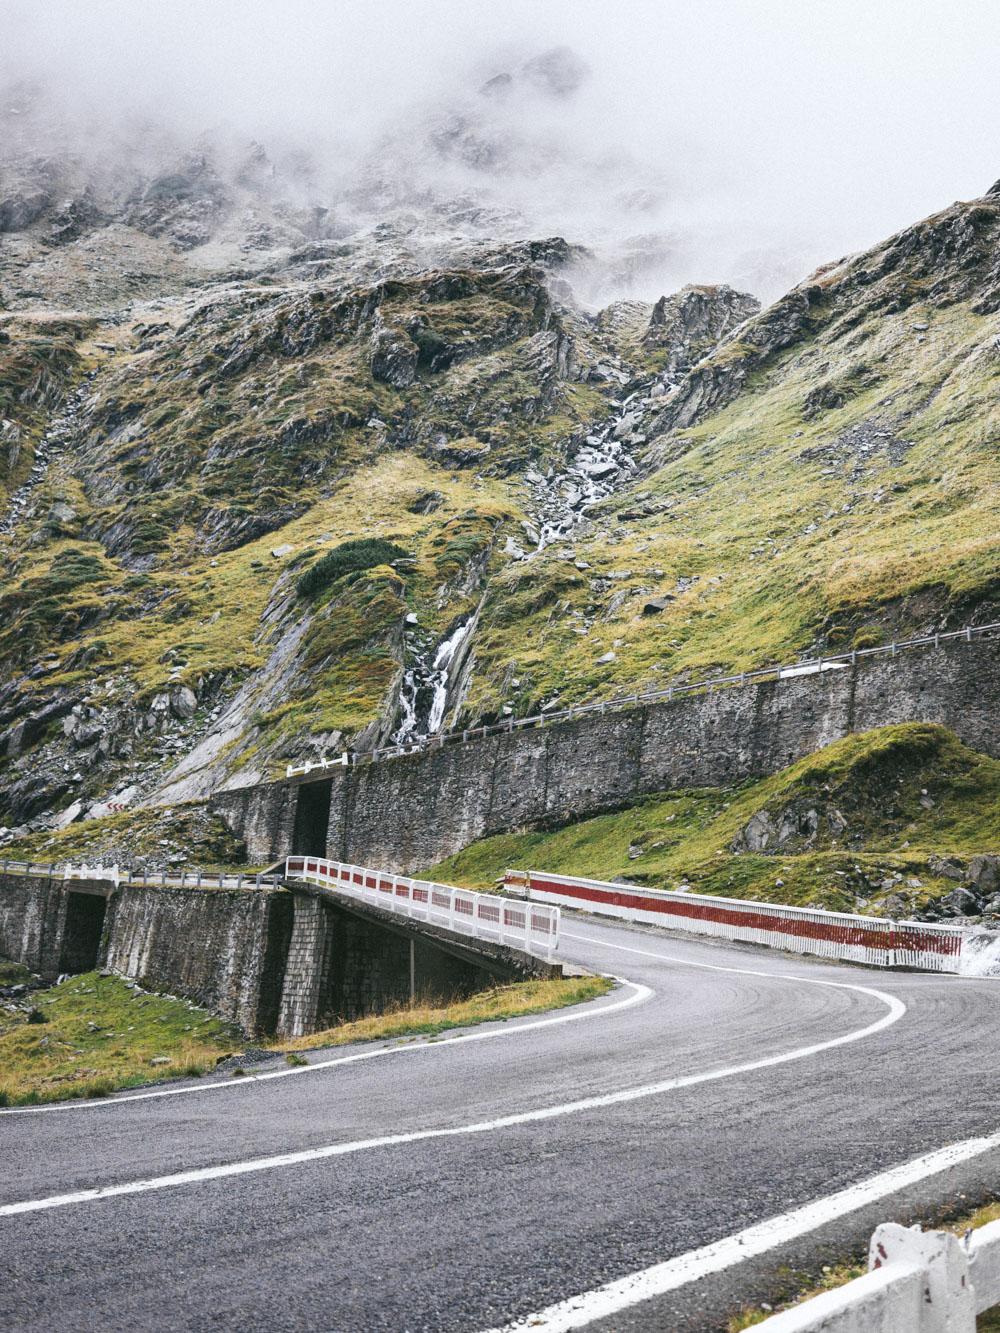 Image of the Transfagarasan National Road.